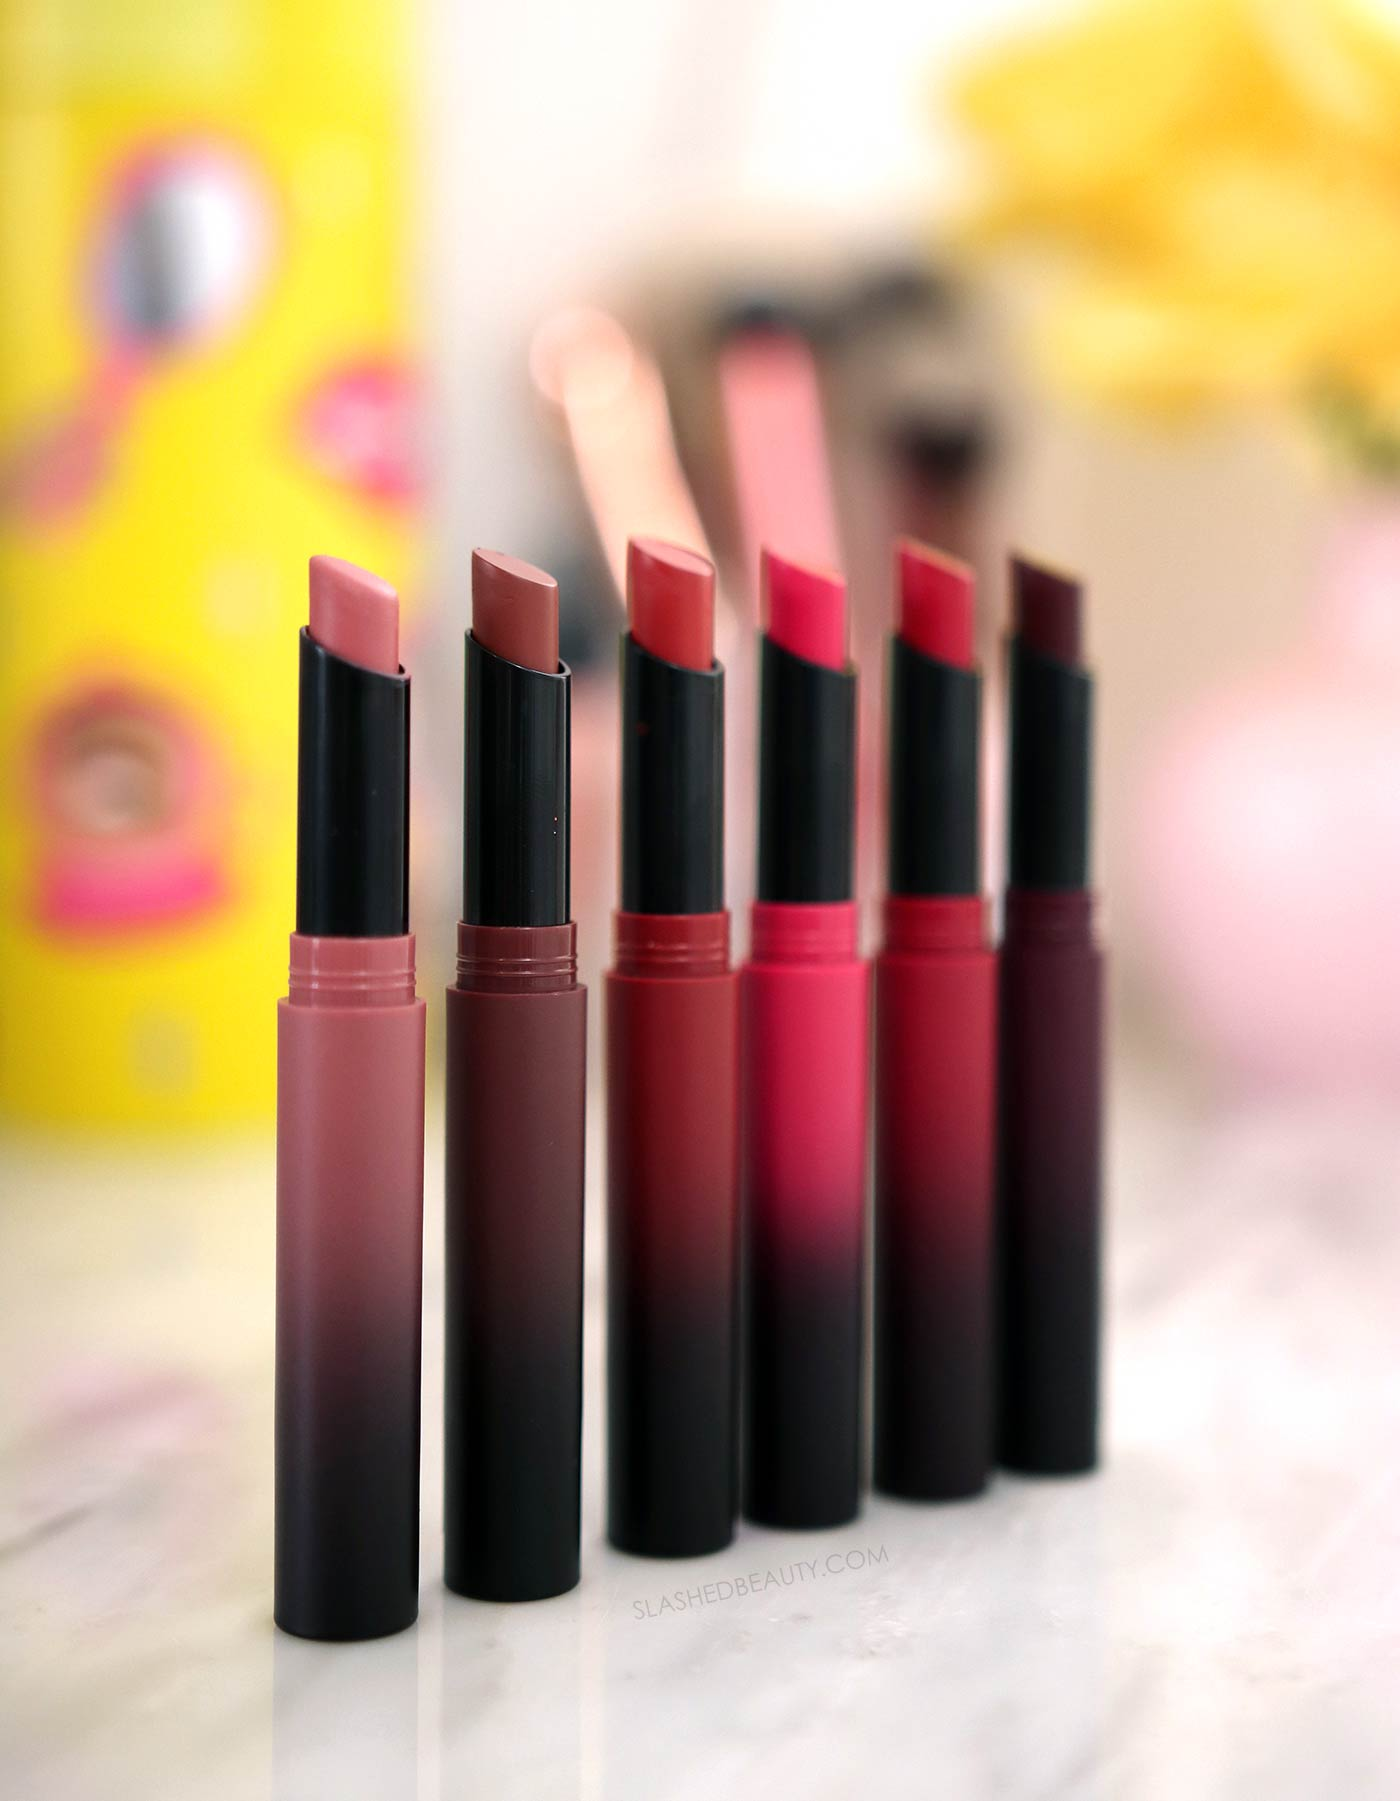 Maybelline Ultimatte Slim Lipsticks Review | Drugstore Matte Lipsticks | More Buff, More Truffle, More Rust, More Magenta, More Ruby, More Berry | Slashed Beauty